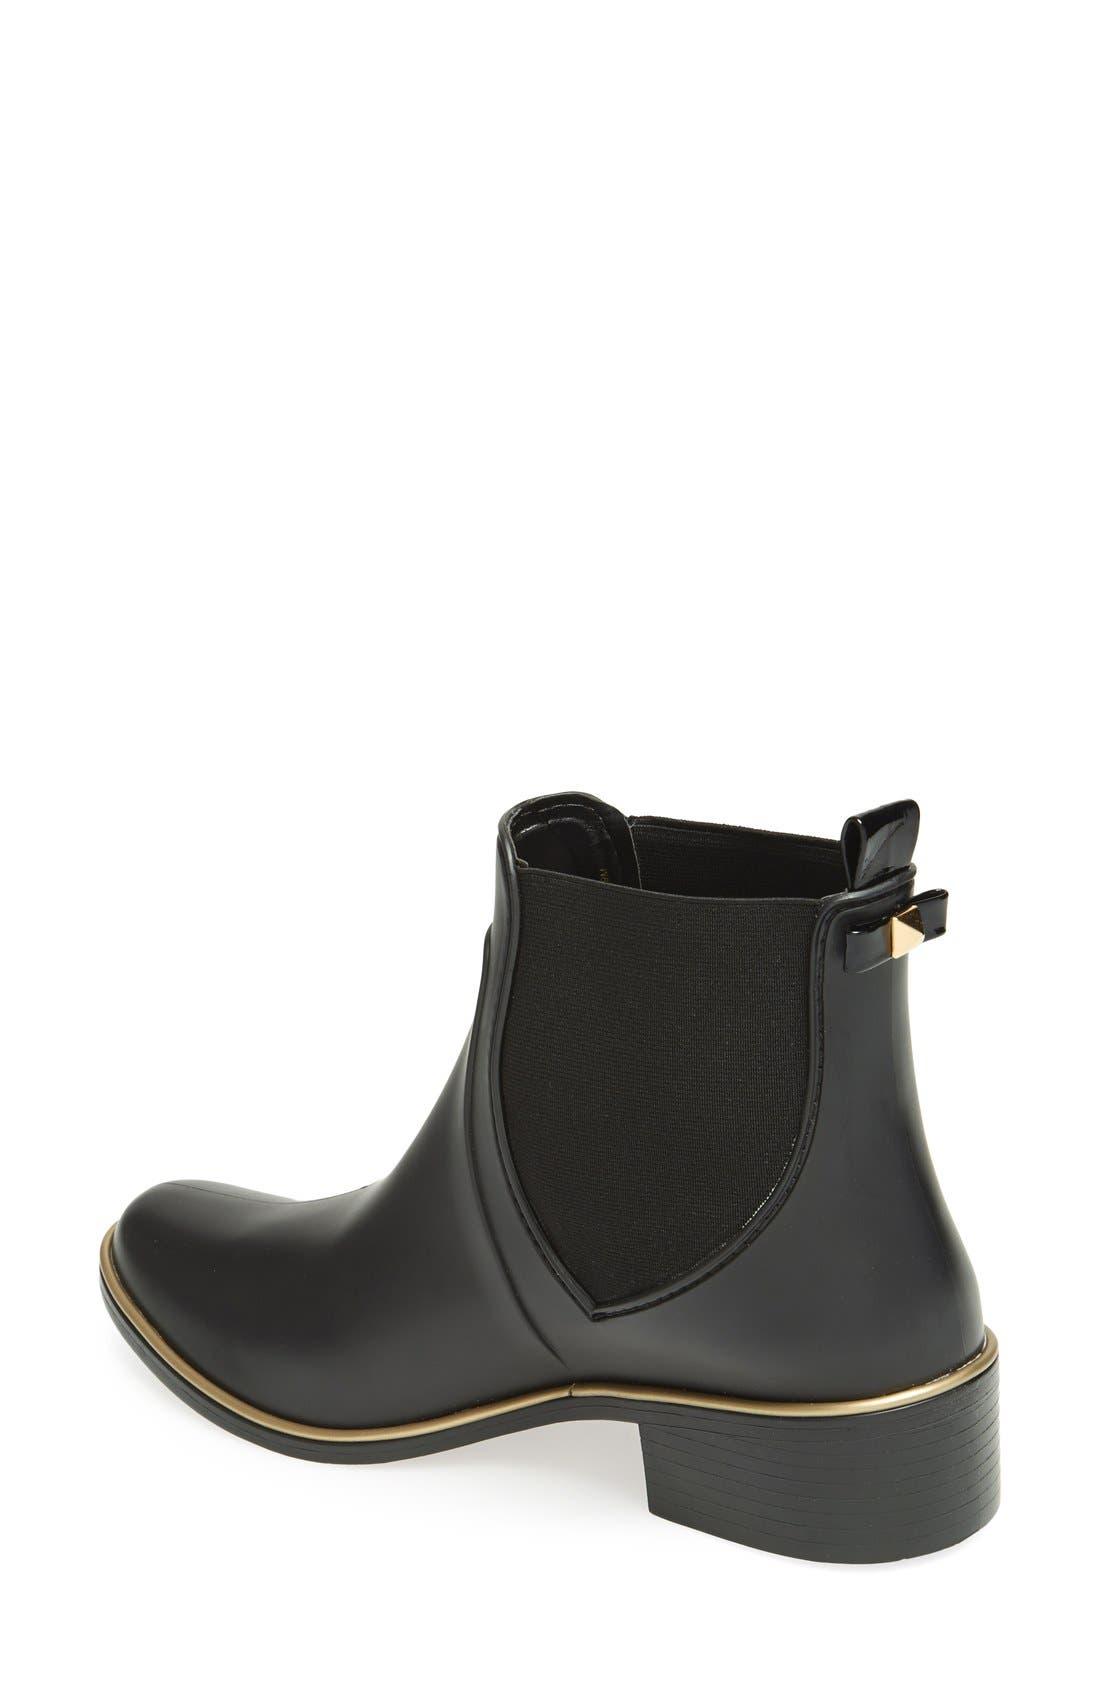 Alternate Image 2  - kate spade new york 'sedgewick' rubber rain boot (Women)